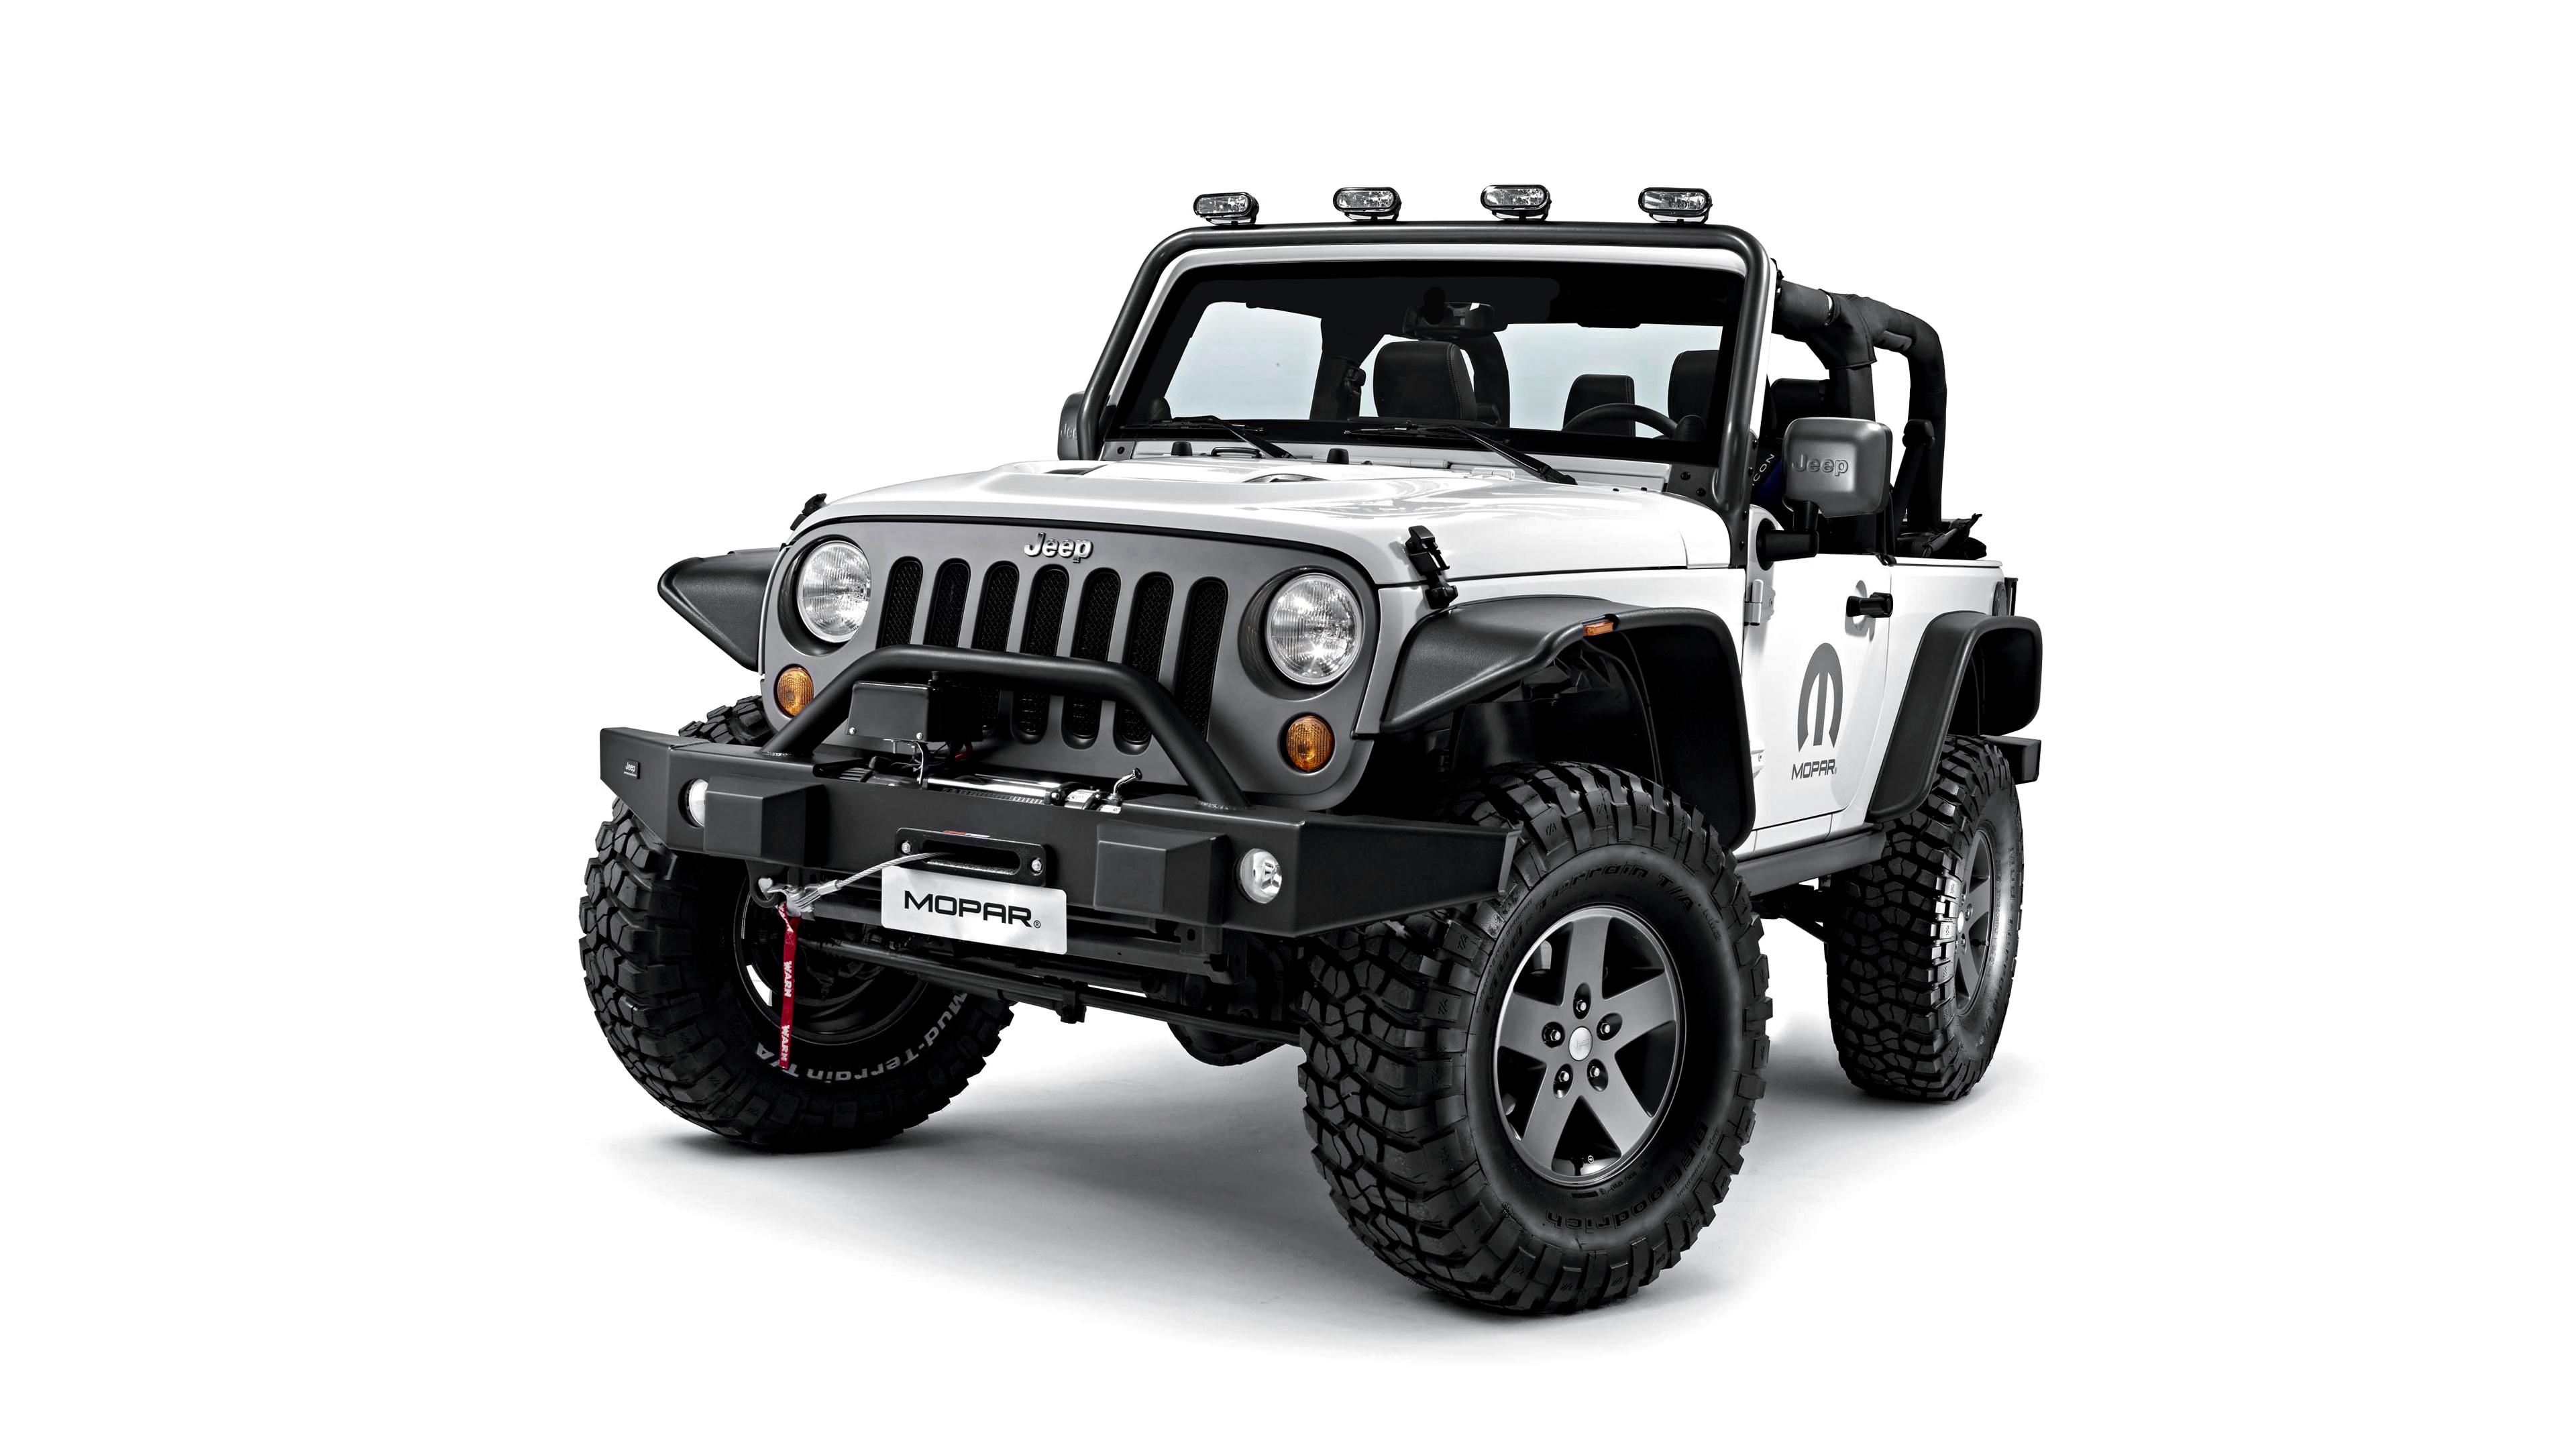 Hd wallpaper jeep - 2015 Jeep Wrangler Unlimited Mopar Wallpaper Hd Car Wallpapers